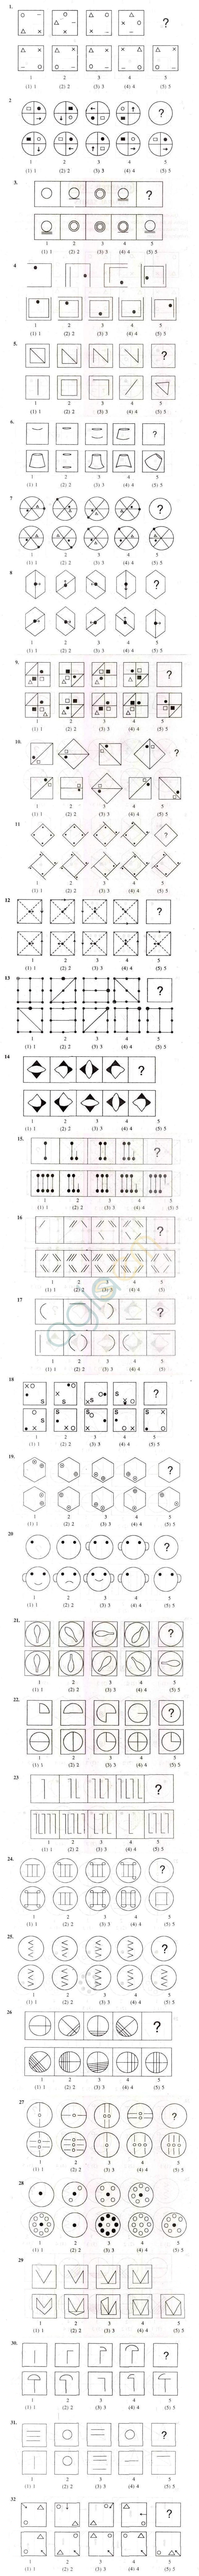 Figural Series